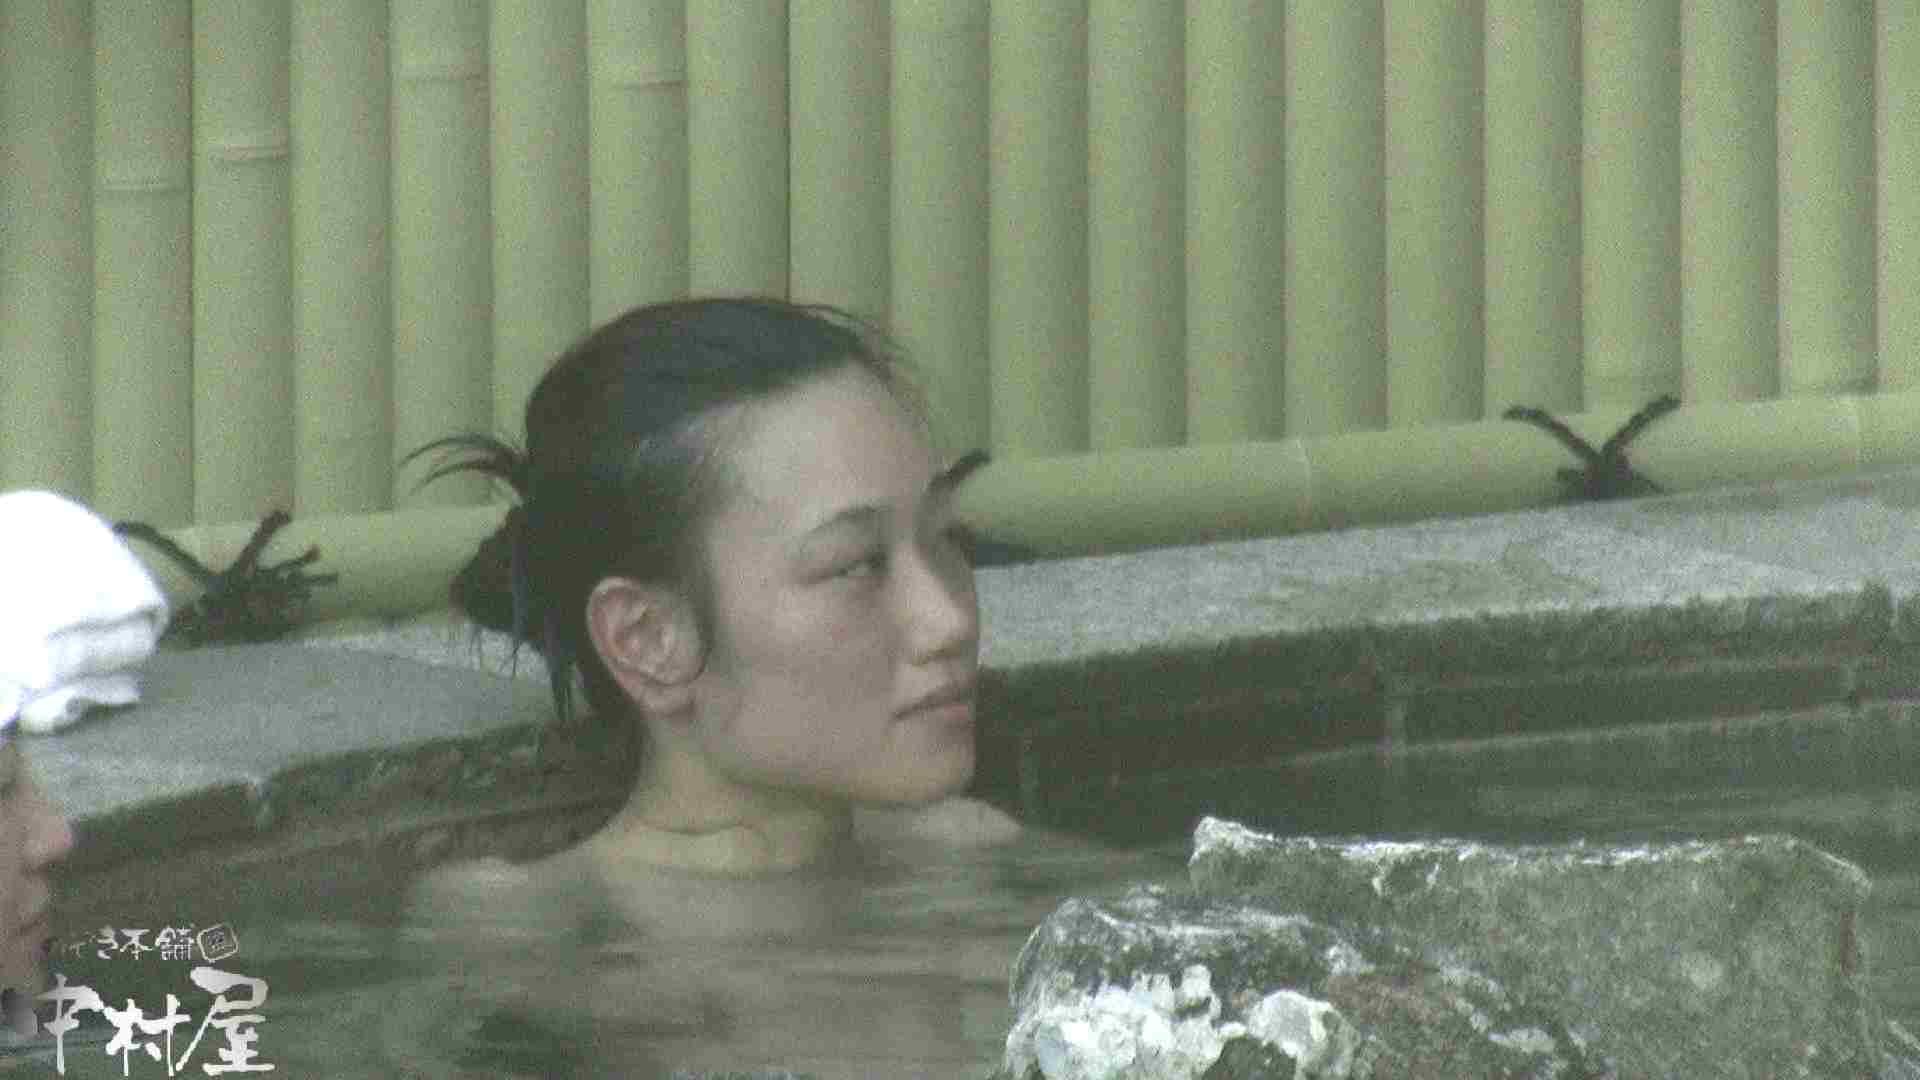 Aquaな露天風呂Vol.914 露天風呂編   盗撮シリーズ  83PIX 69